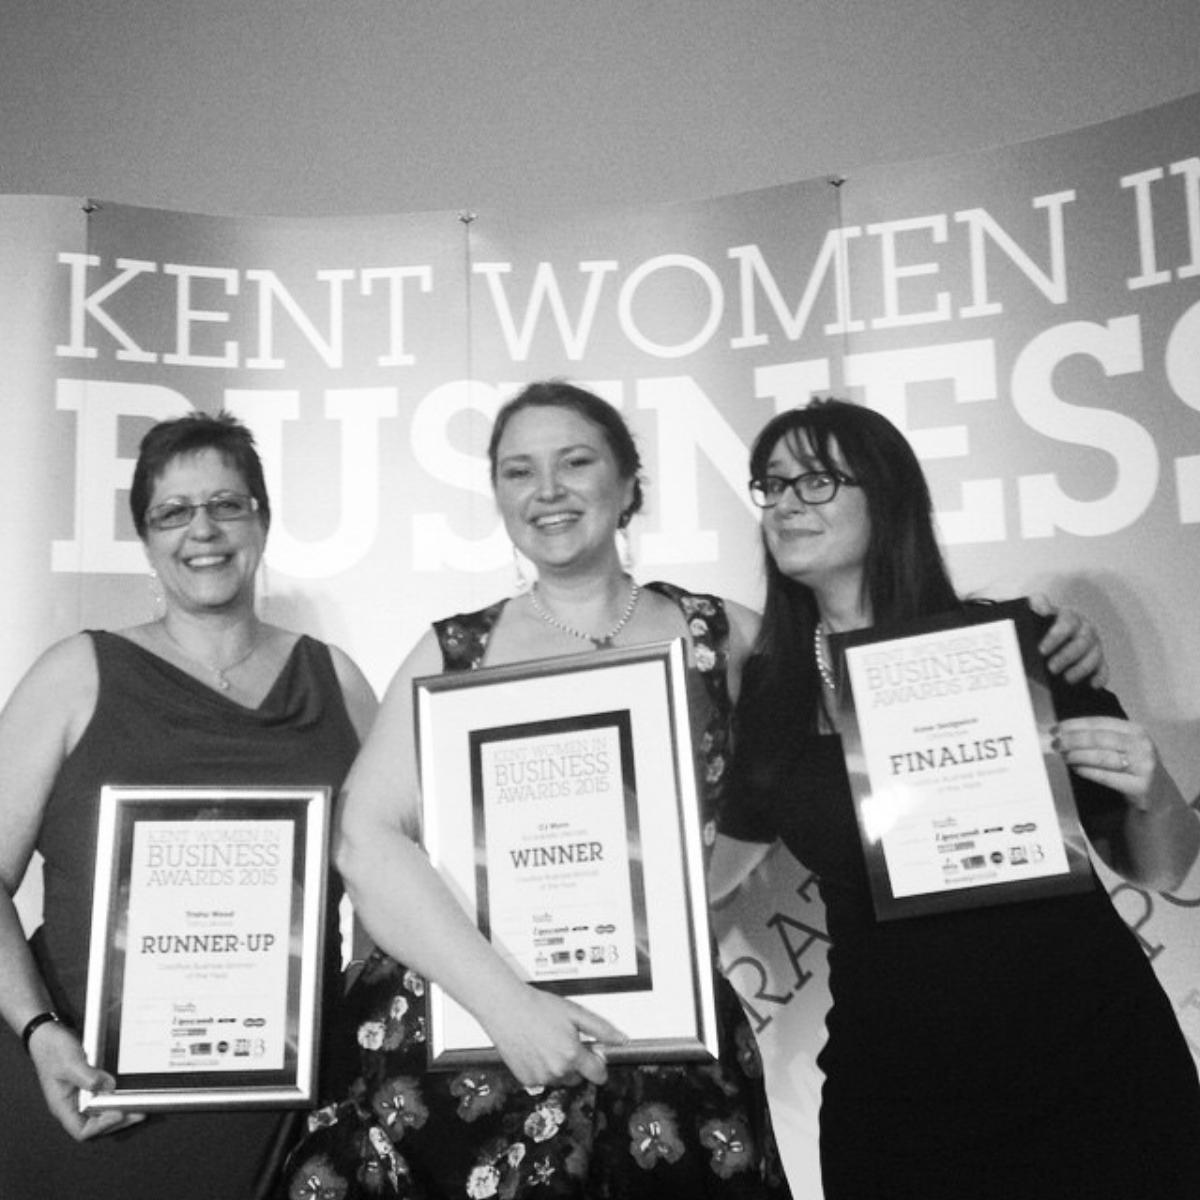 CJ Munn, Trisha Wood & Kaye Sedgwick-Jones receive awards